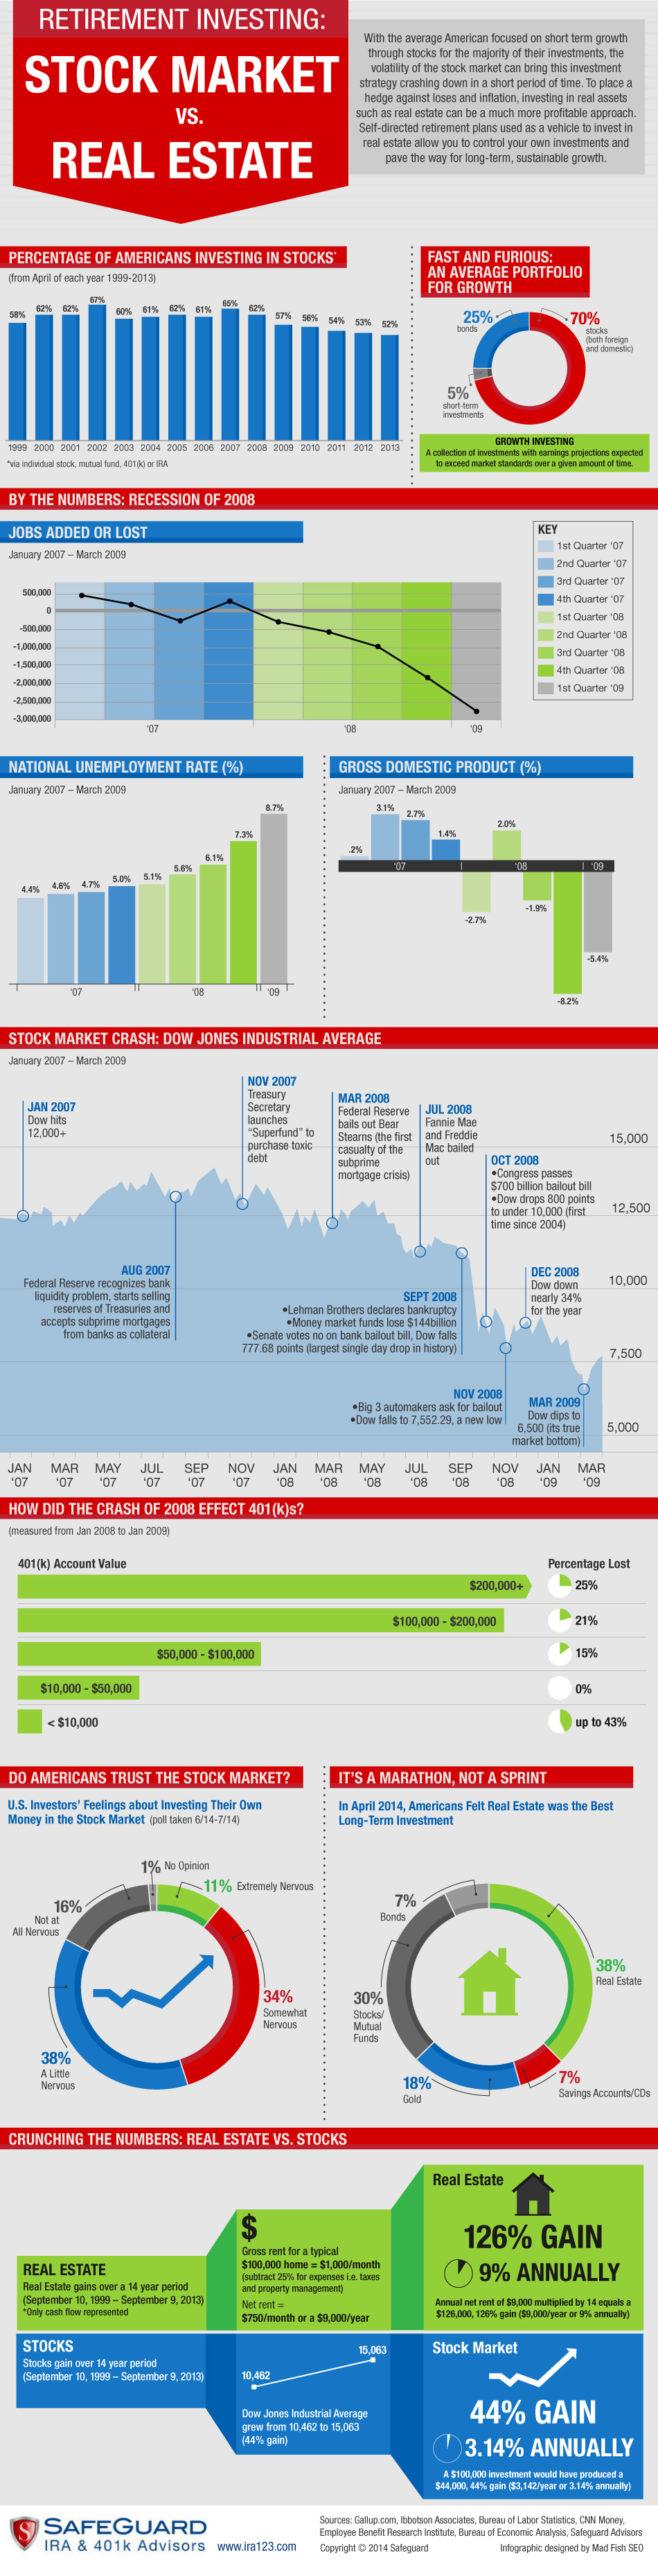 Safeguard Infographic Real Estate vs Stocks Sep 2014